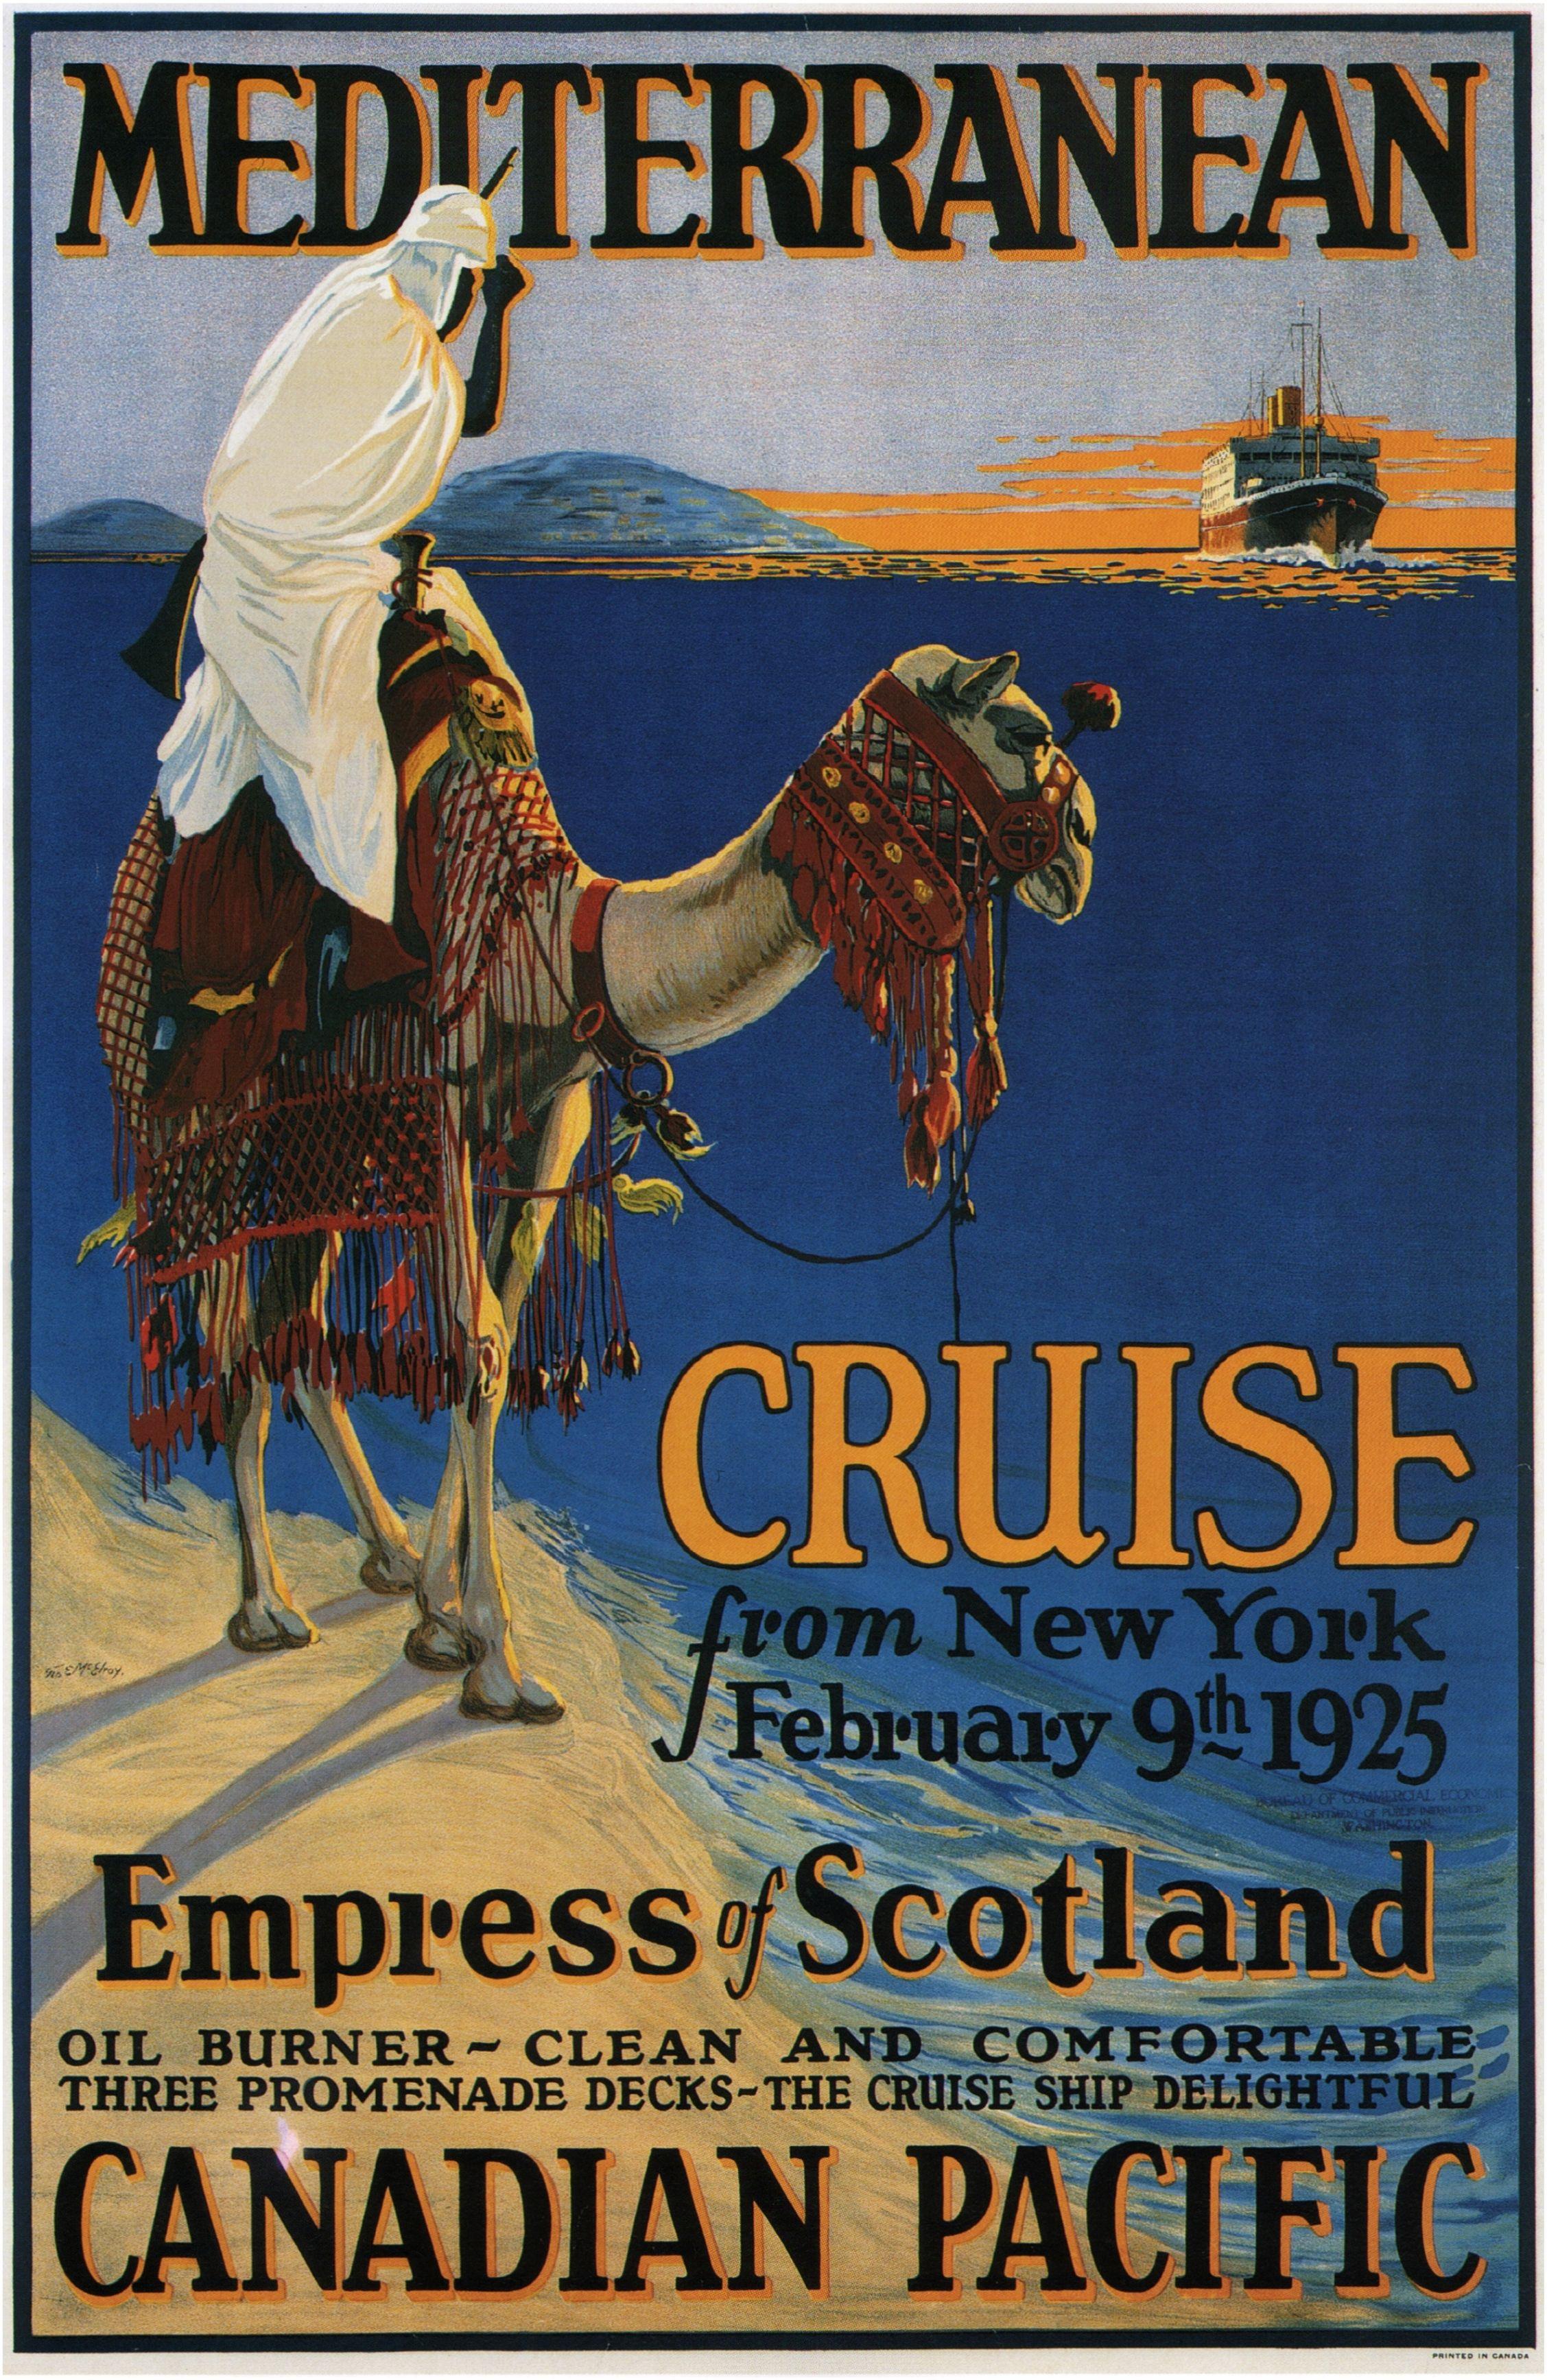 Canadian Pacific Mediterranean Vintage Cruise Posters Vintage Posters Vintage Travel Posters